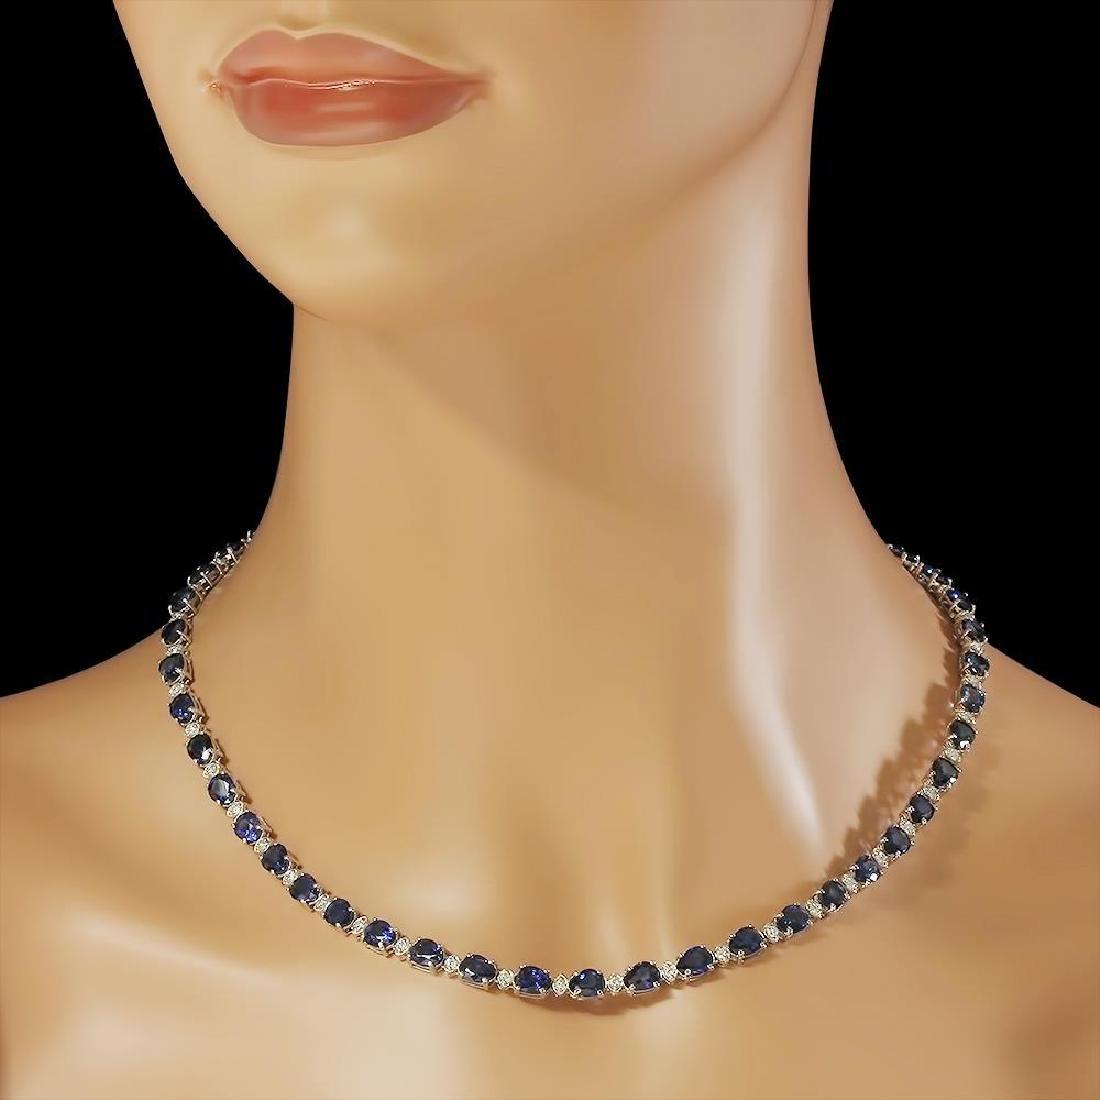 14K Gold 31.39ct Sapphire 1.52ct Diamond Necklace - 3